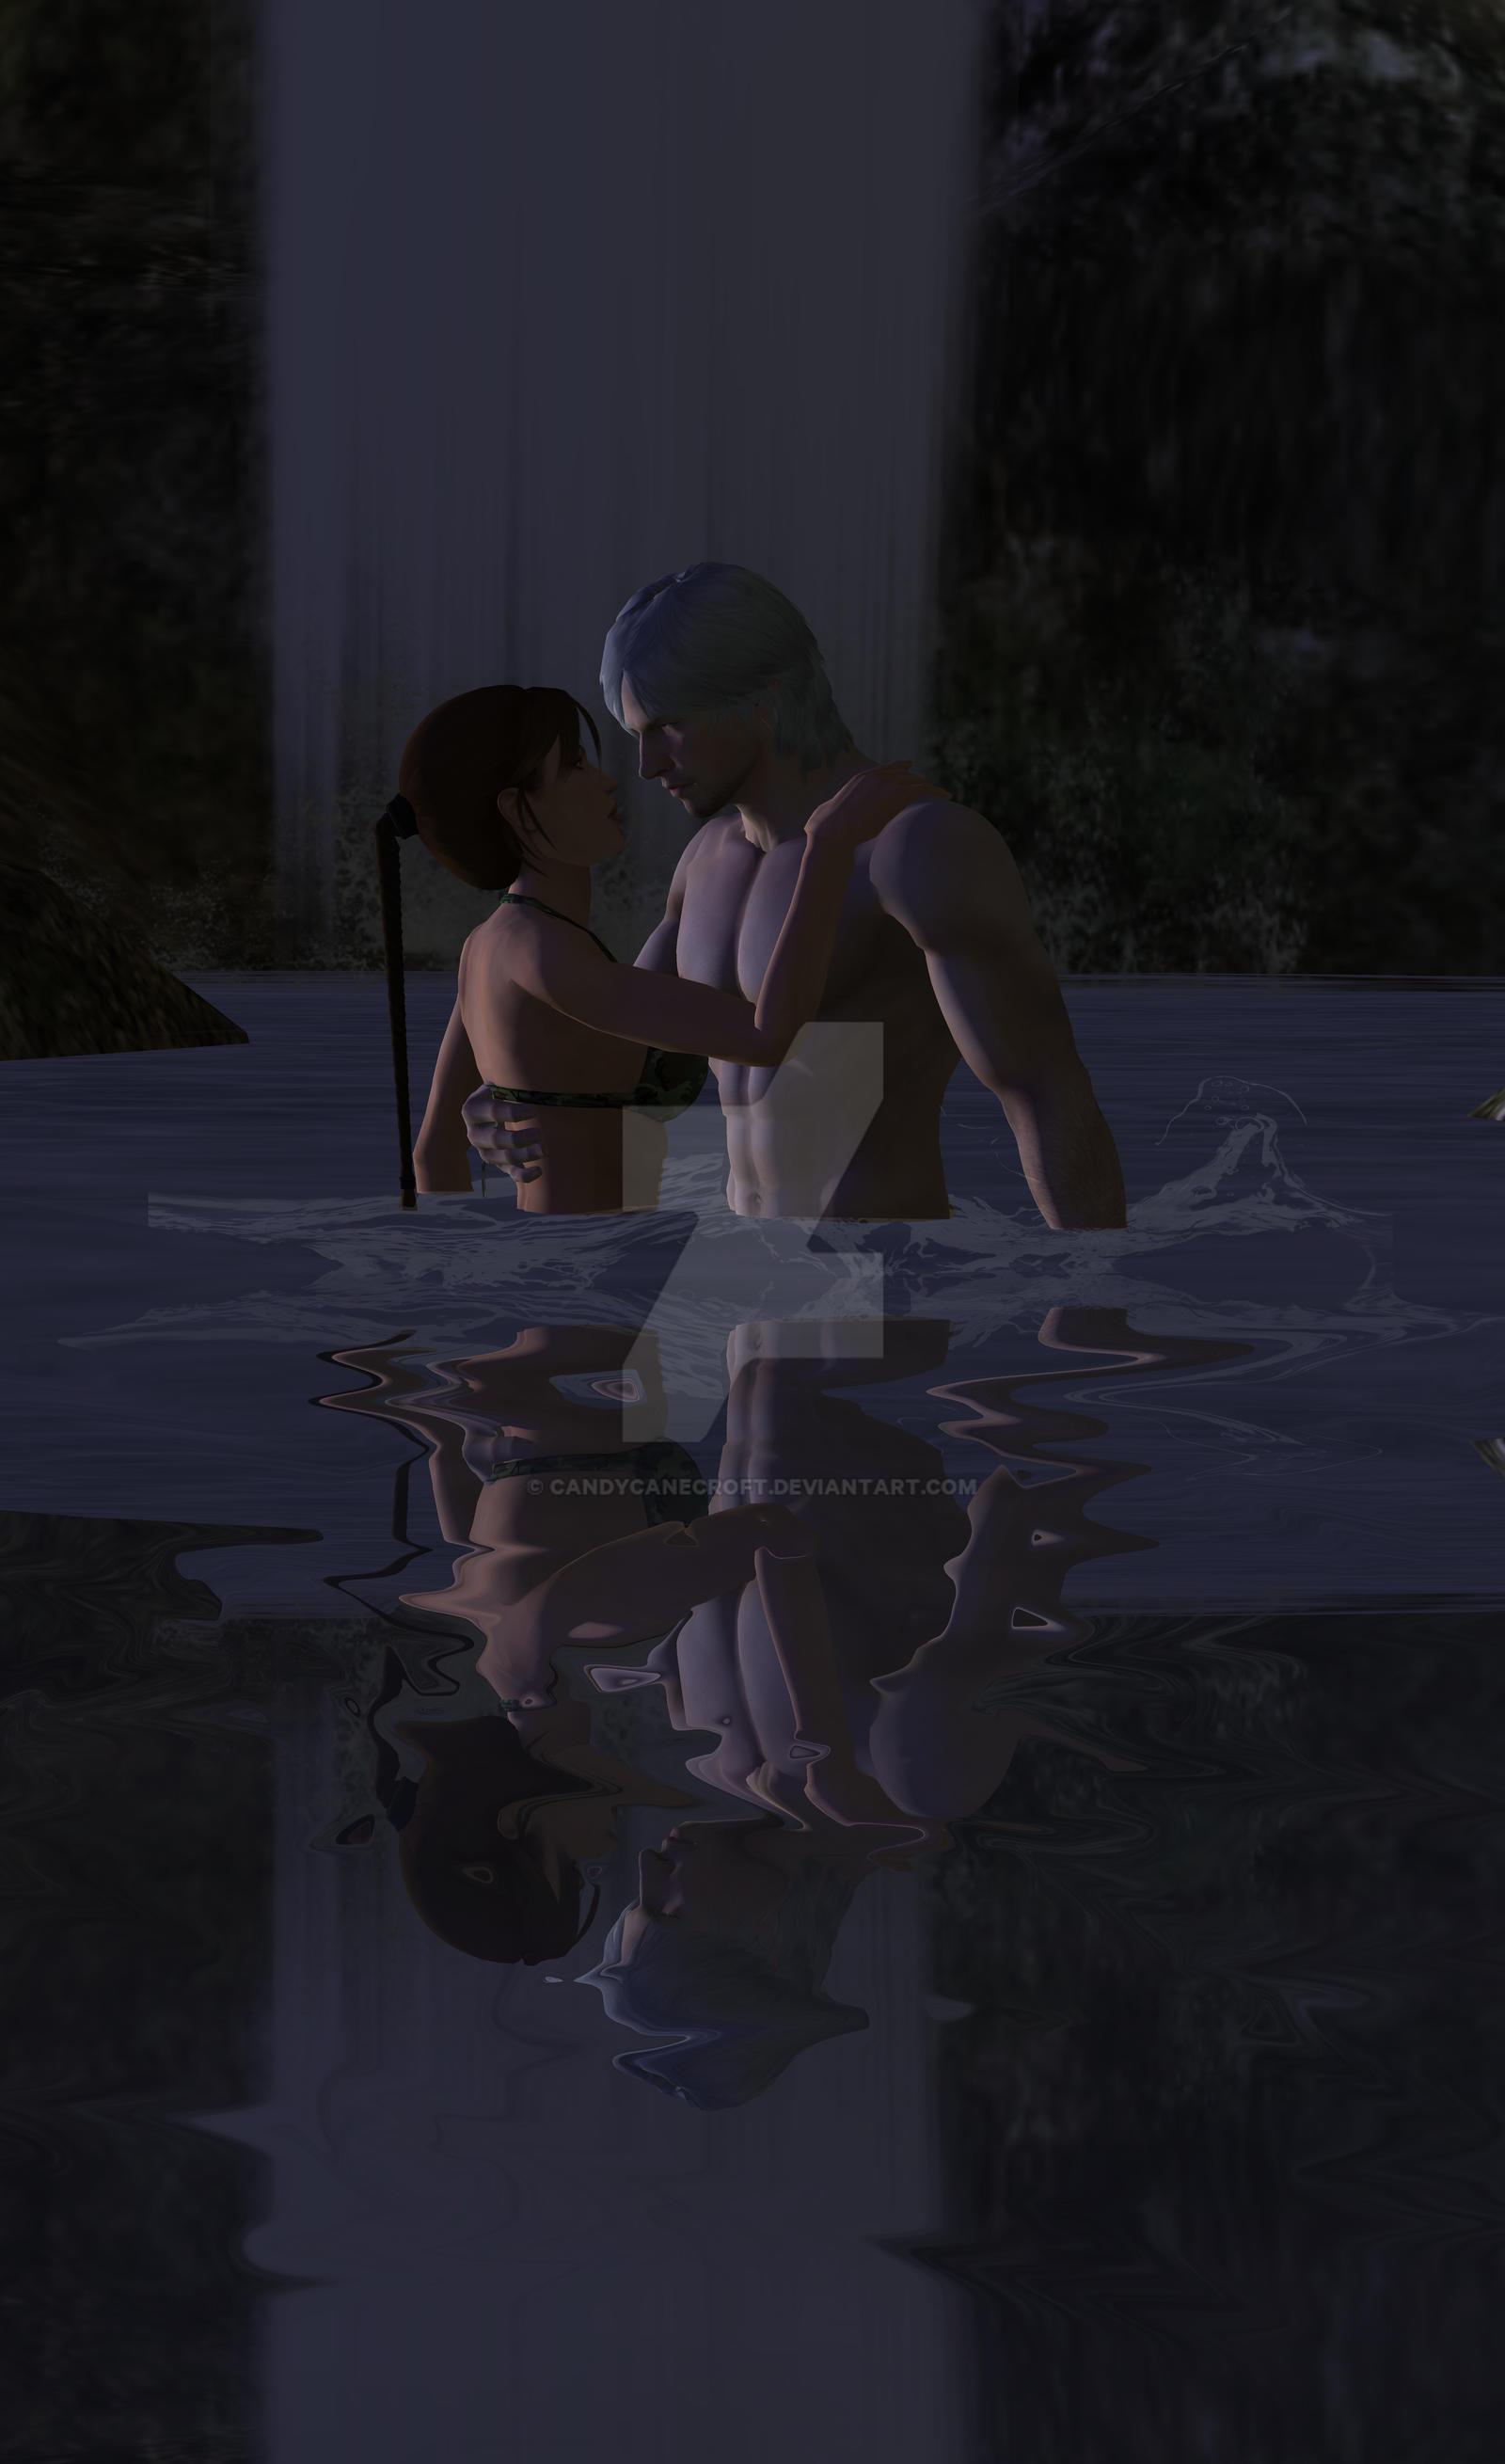 Dante X Lara Croft 115 by candycanecroft